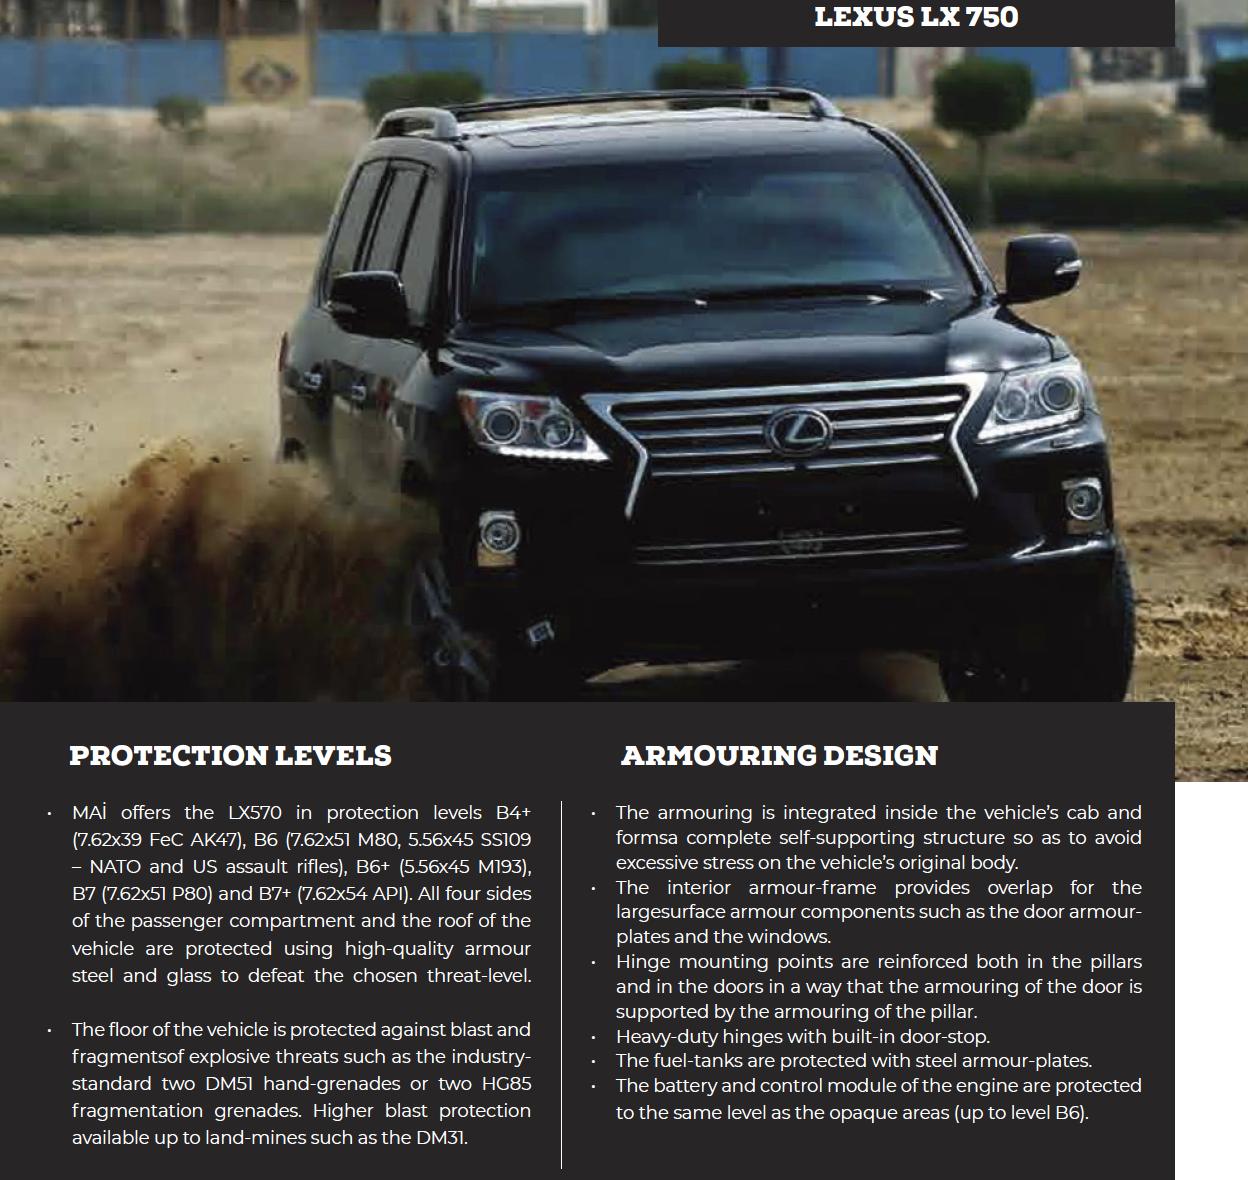 Lexus LX 750